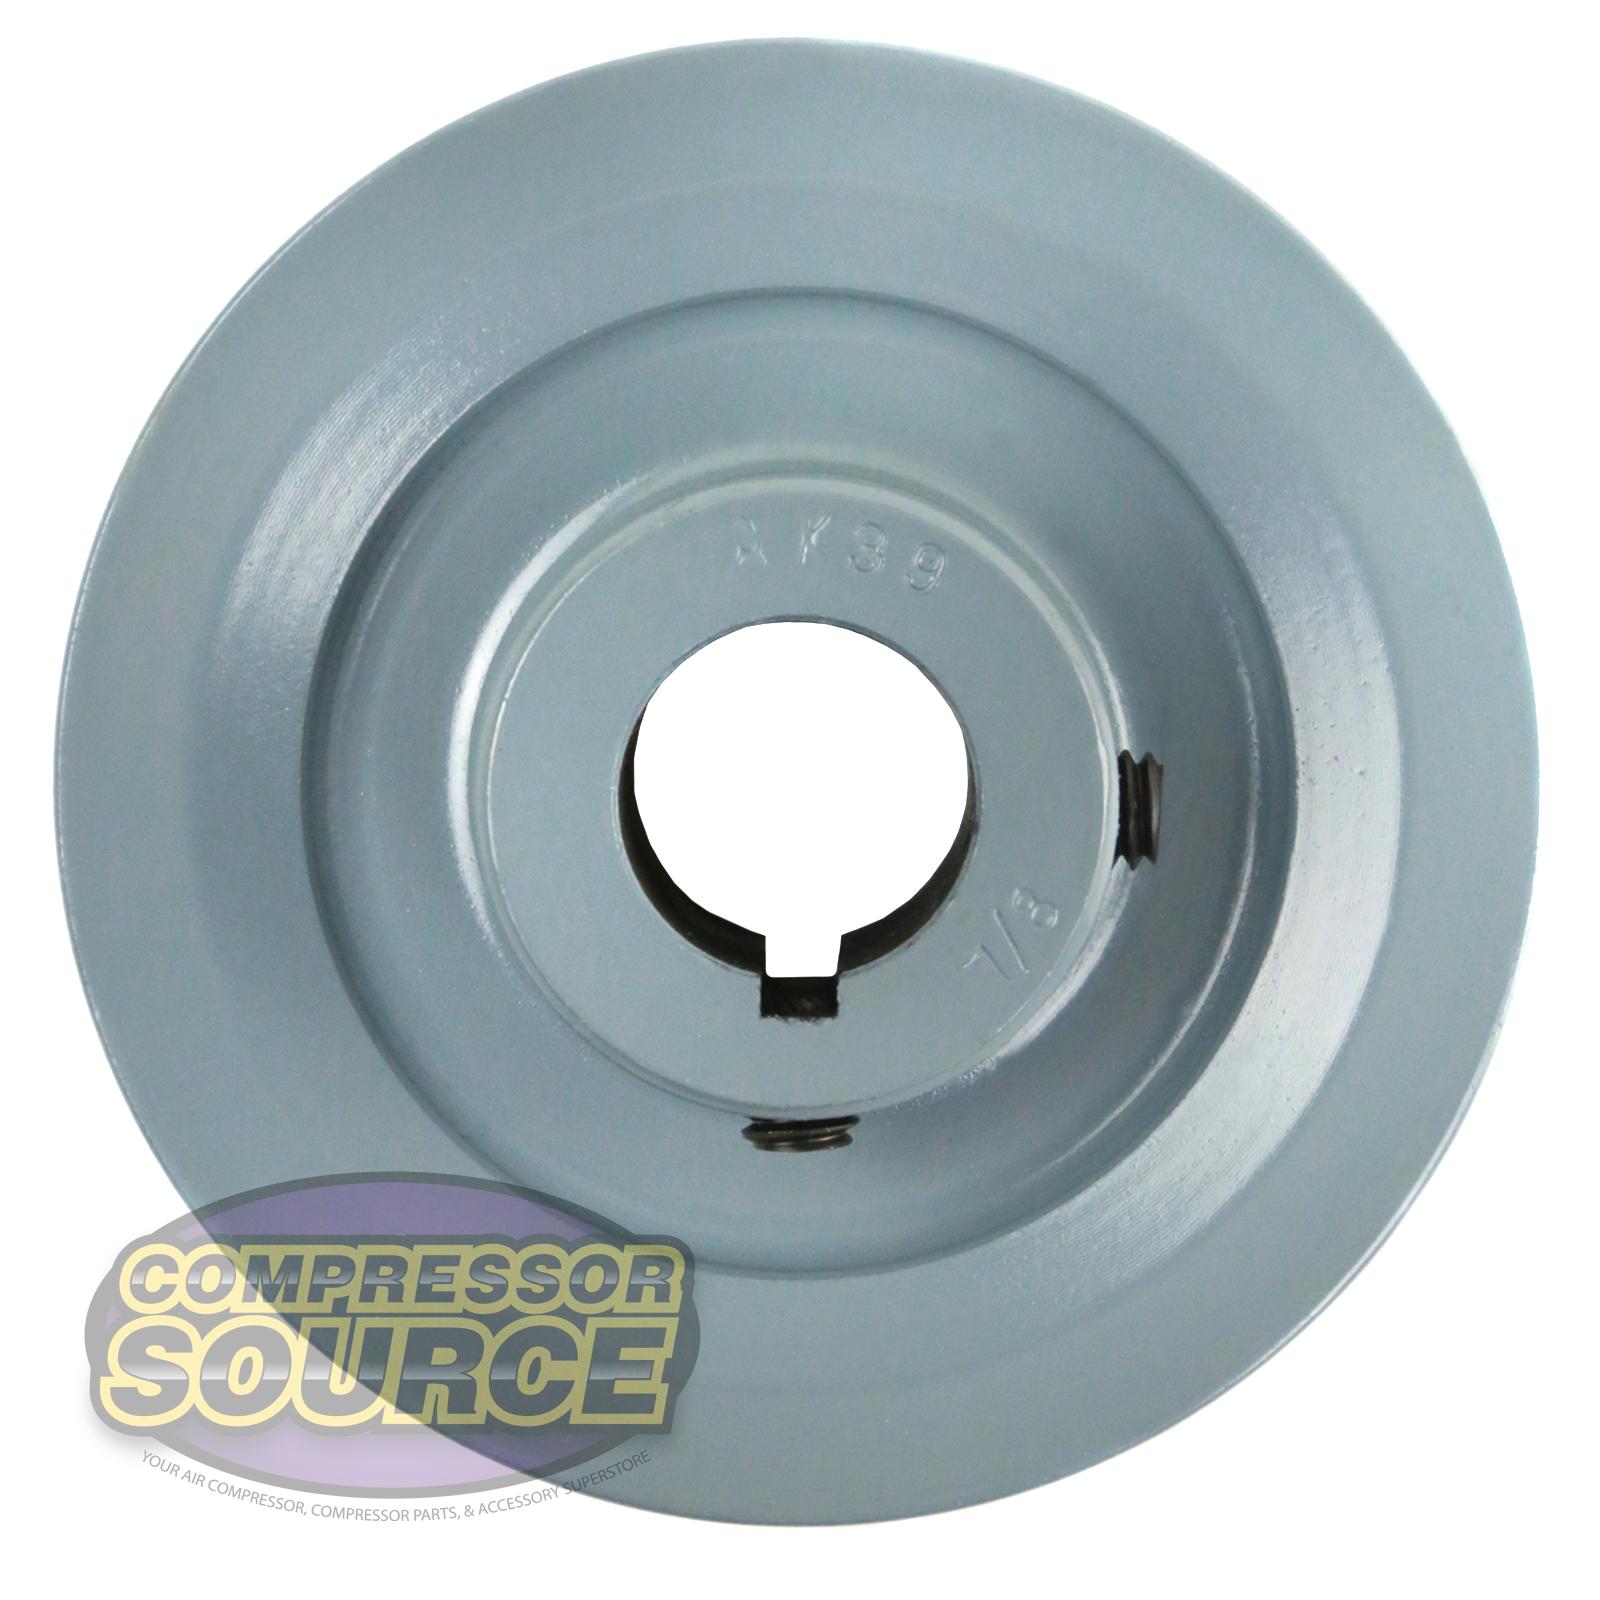 1.500 x 3.000 x 0.375 1.500 x 3.000 x 0.375 Dichtomatik Partner Factory TCM 15303TB-BX NBR //Carbon Steel Oil Seal Buna Rubber TB Type